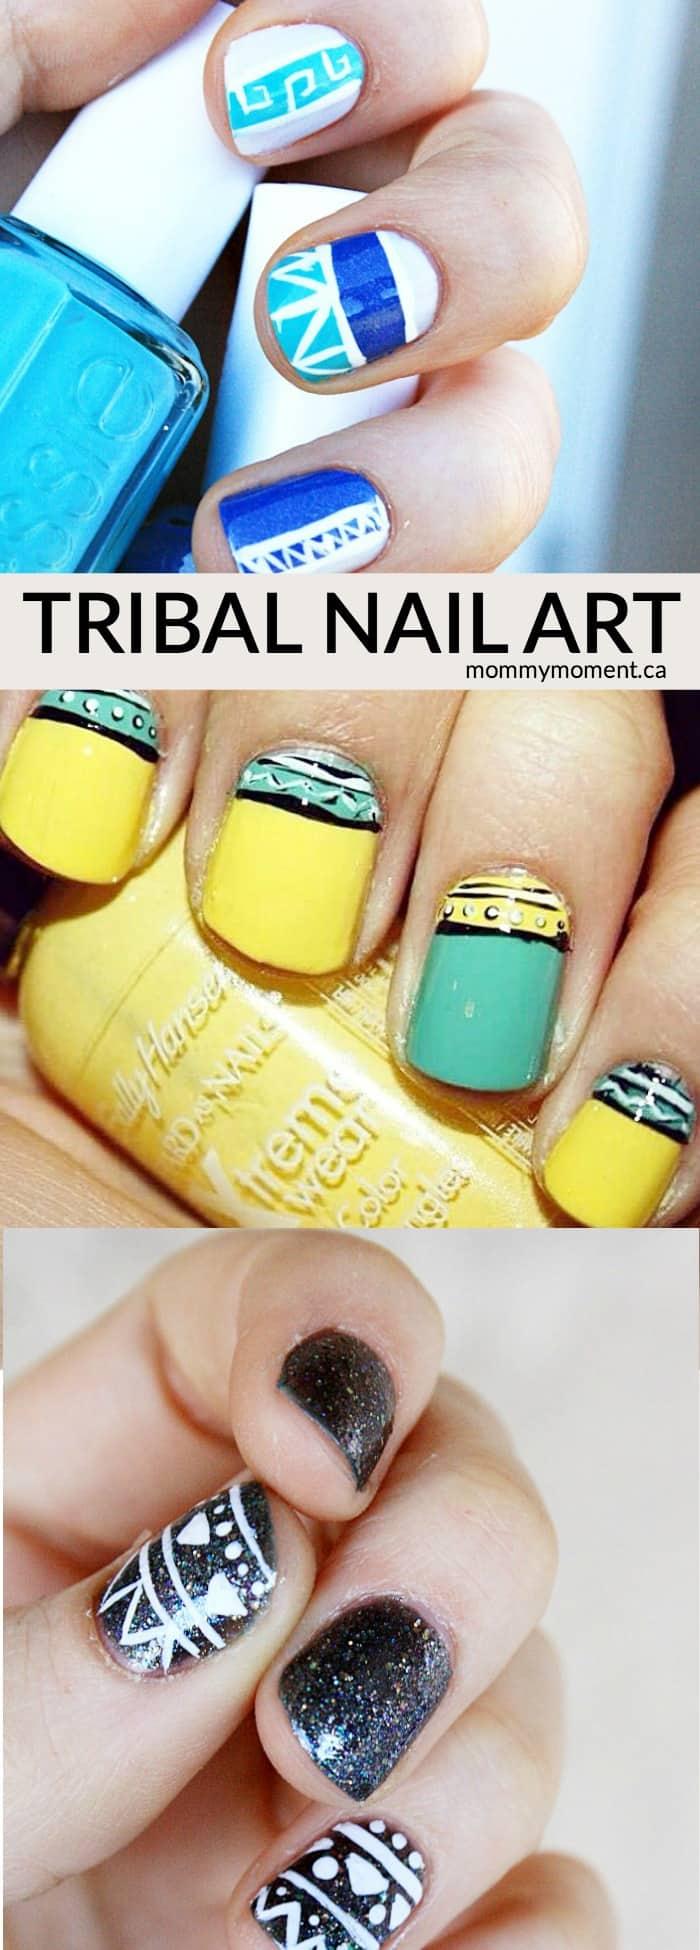 Tribal-nail-art